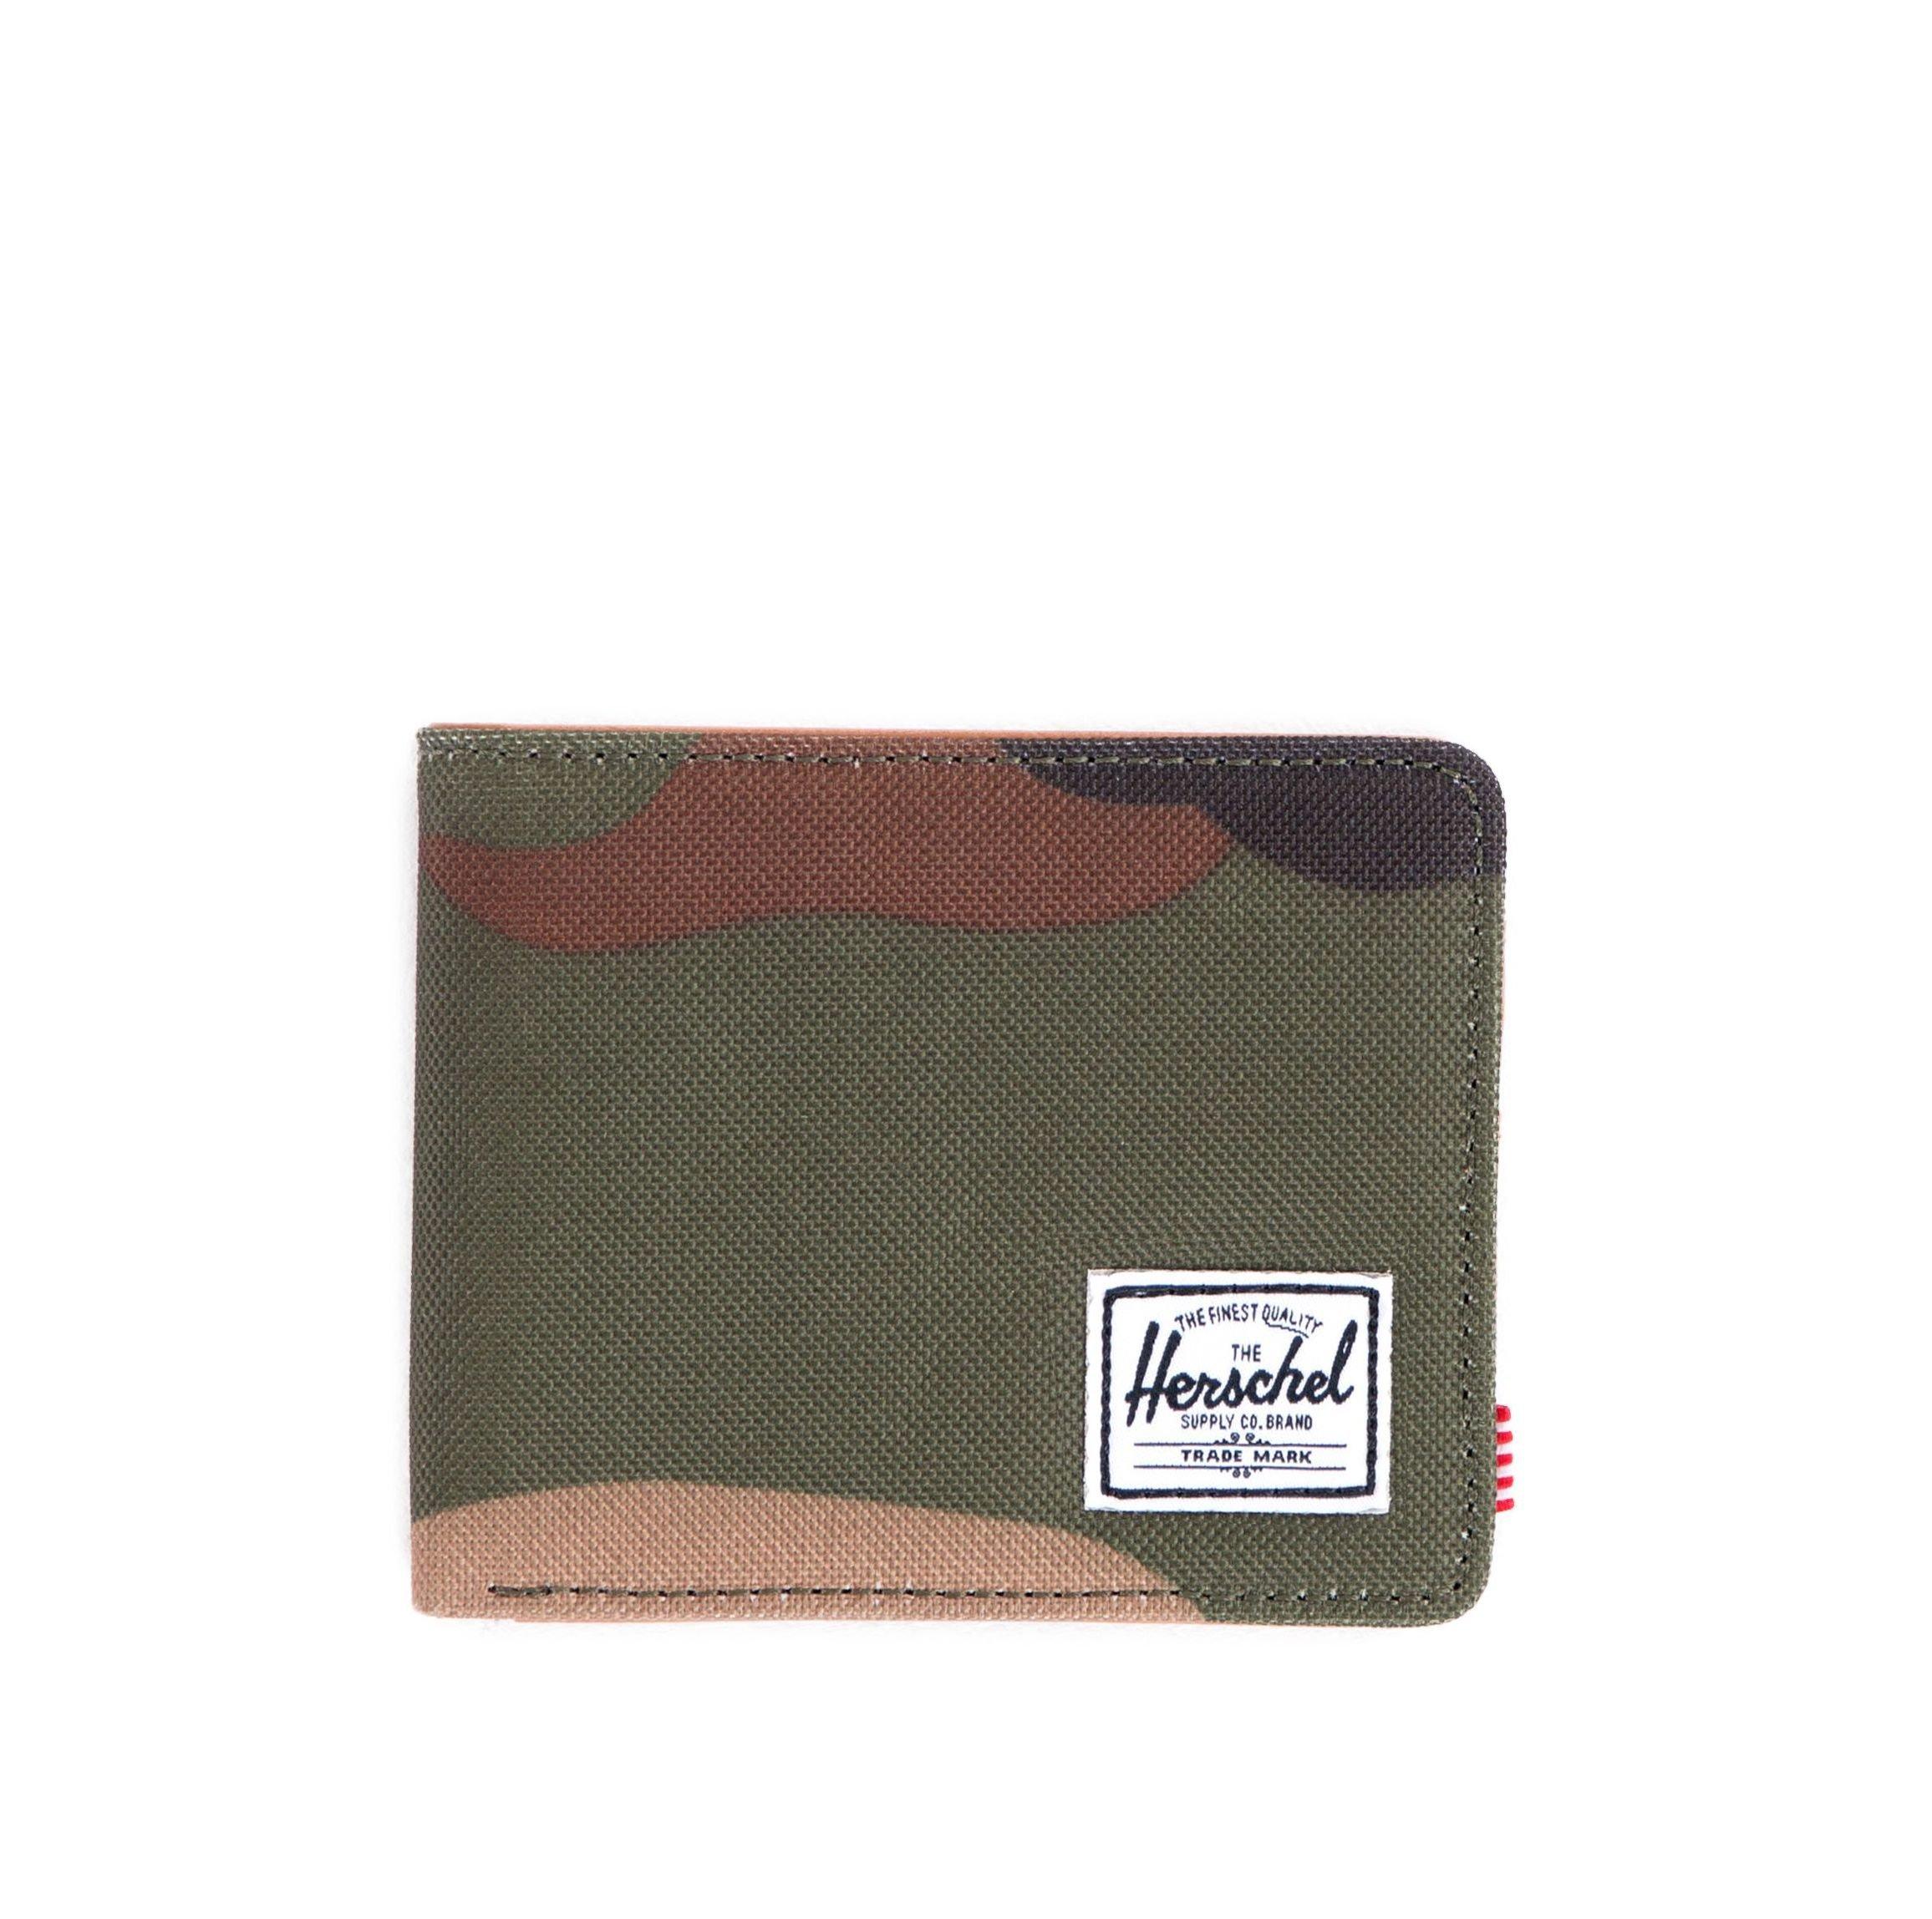 Herschel Supply Co. Hank Wallet, Grey, One Size